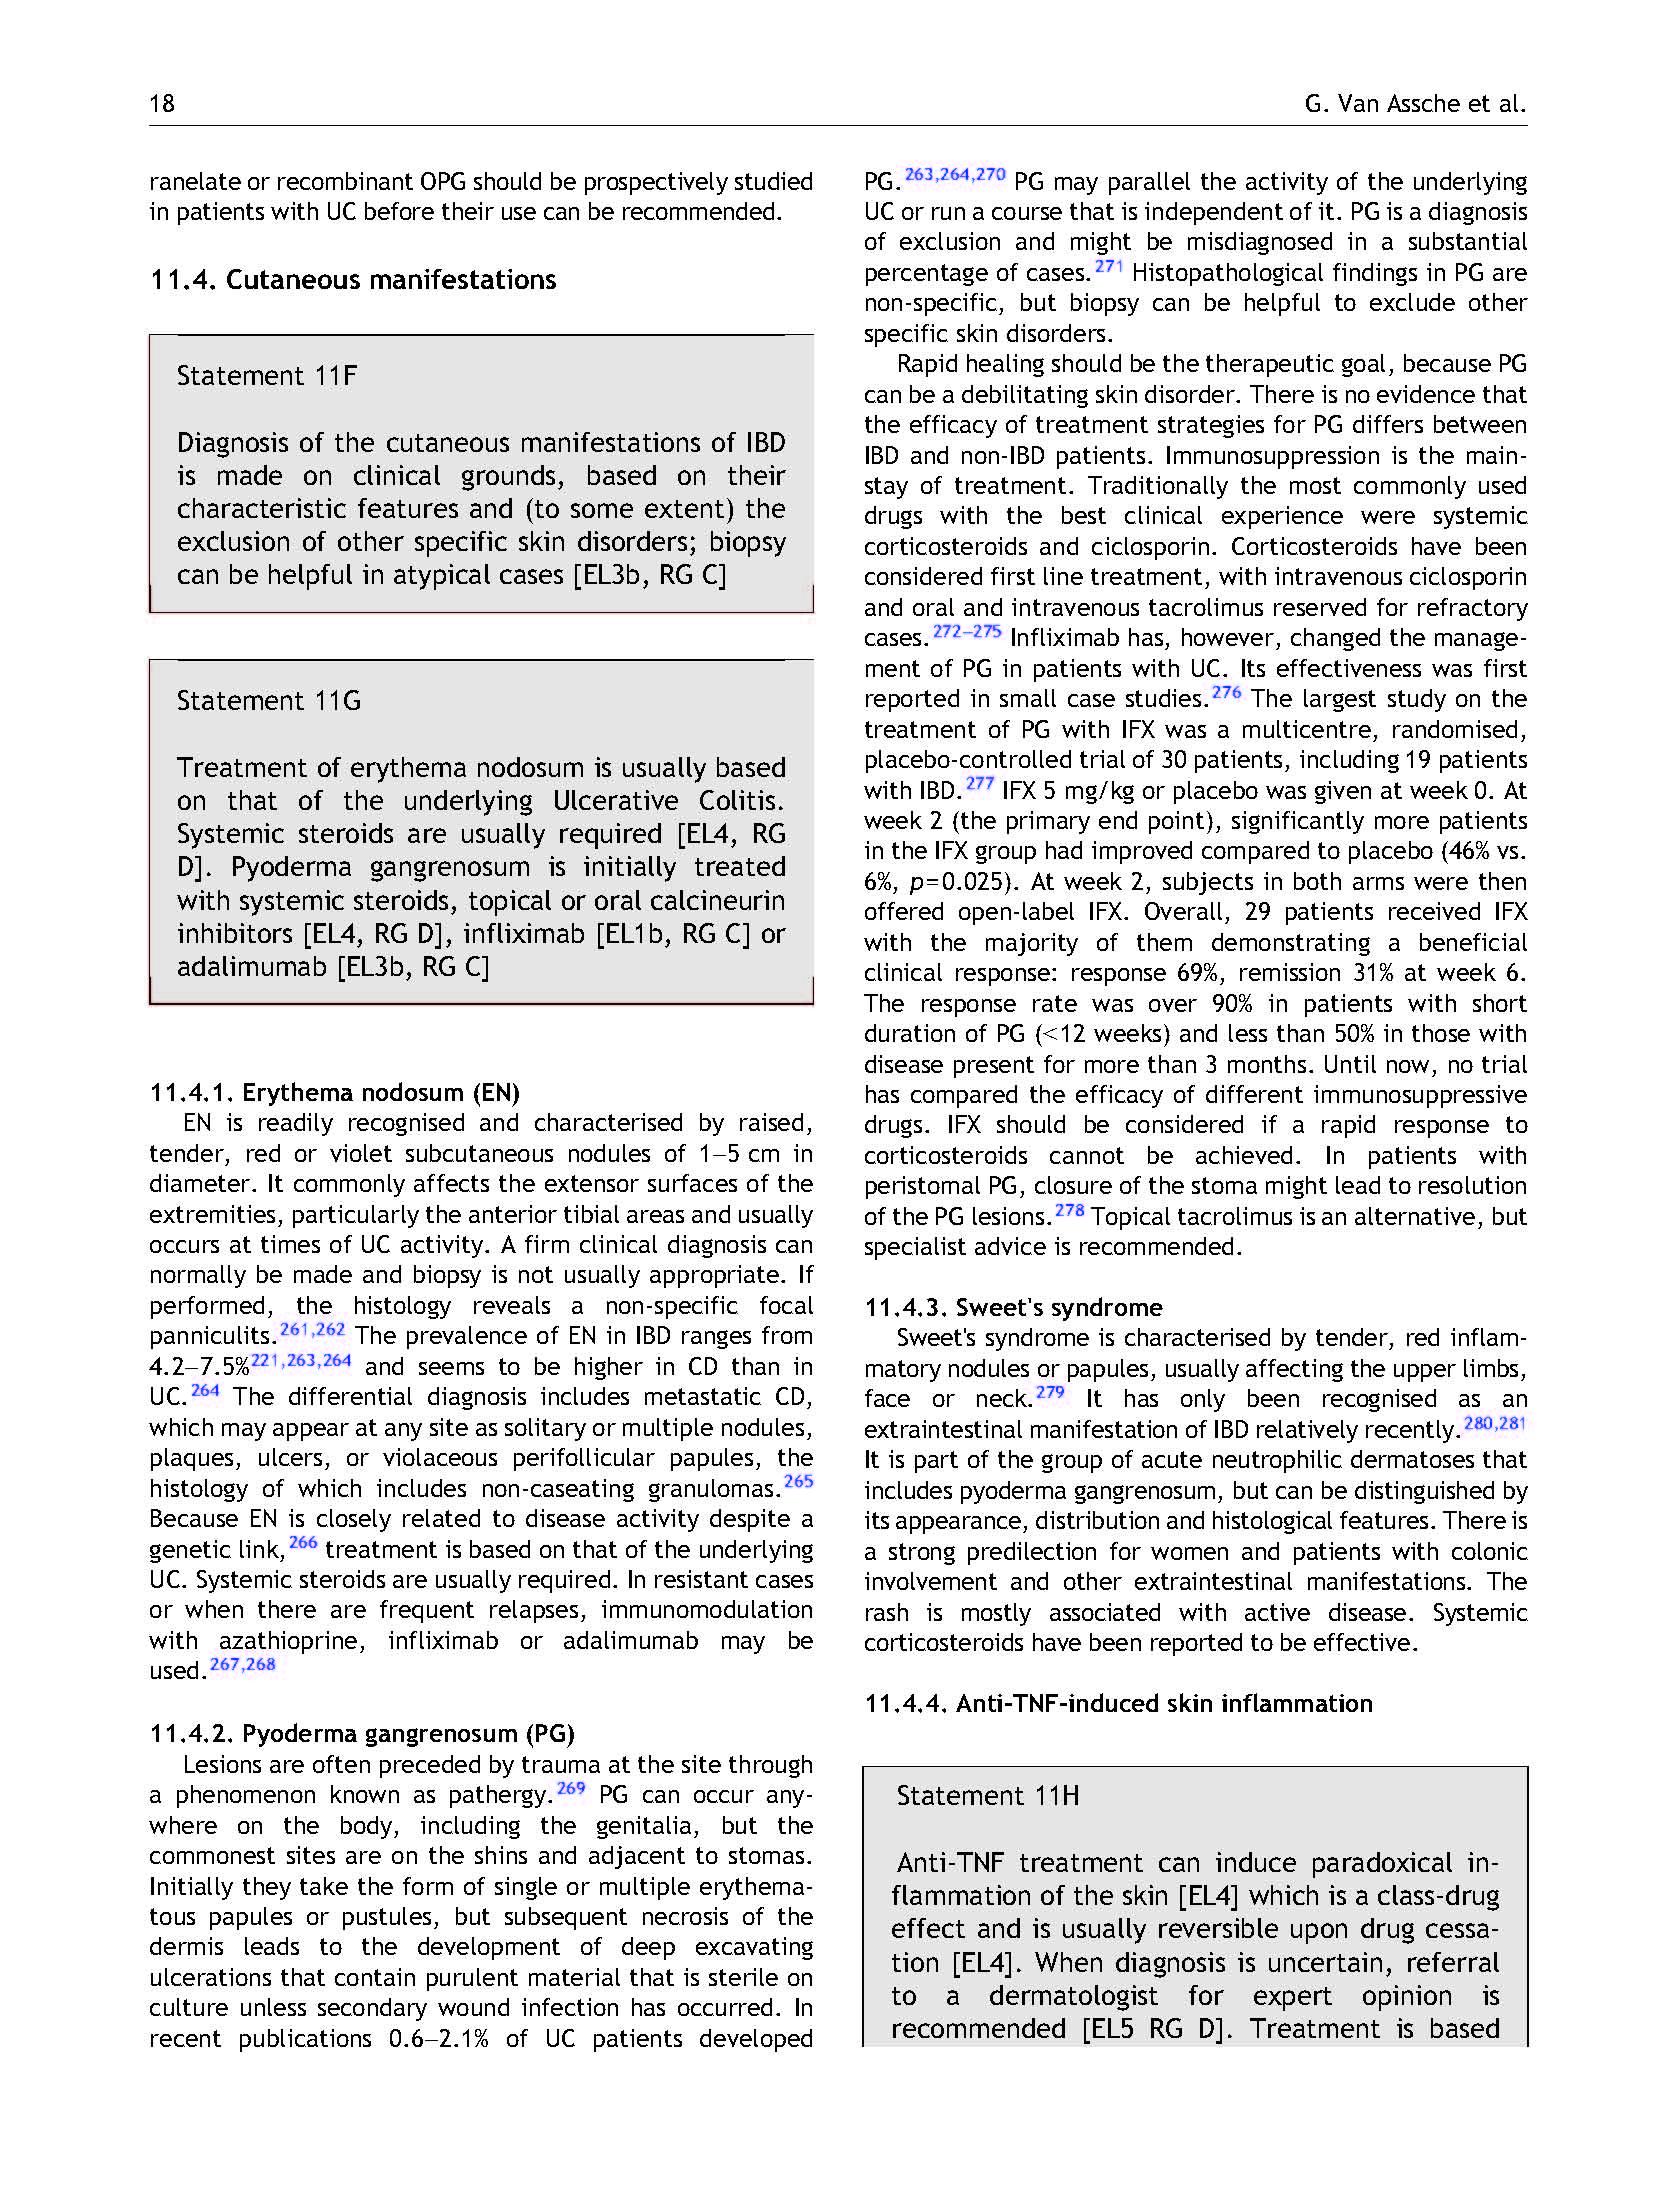 2012-ECCO第二版-欧洲询证共识:溃疡性结肠炎的诊断和处理—特殊情况_页面_18.jpg